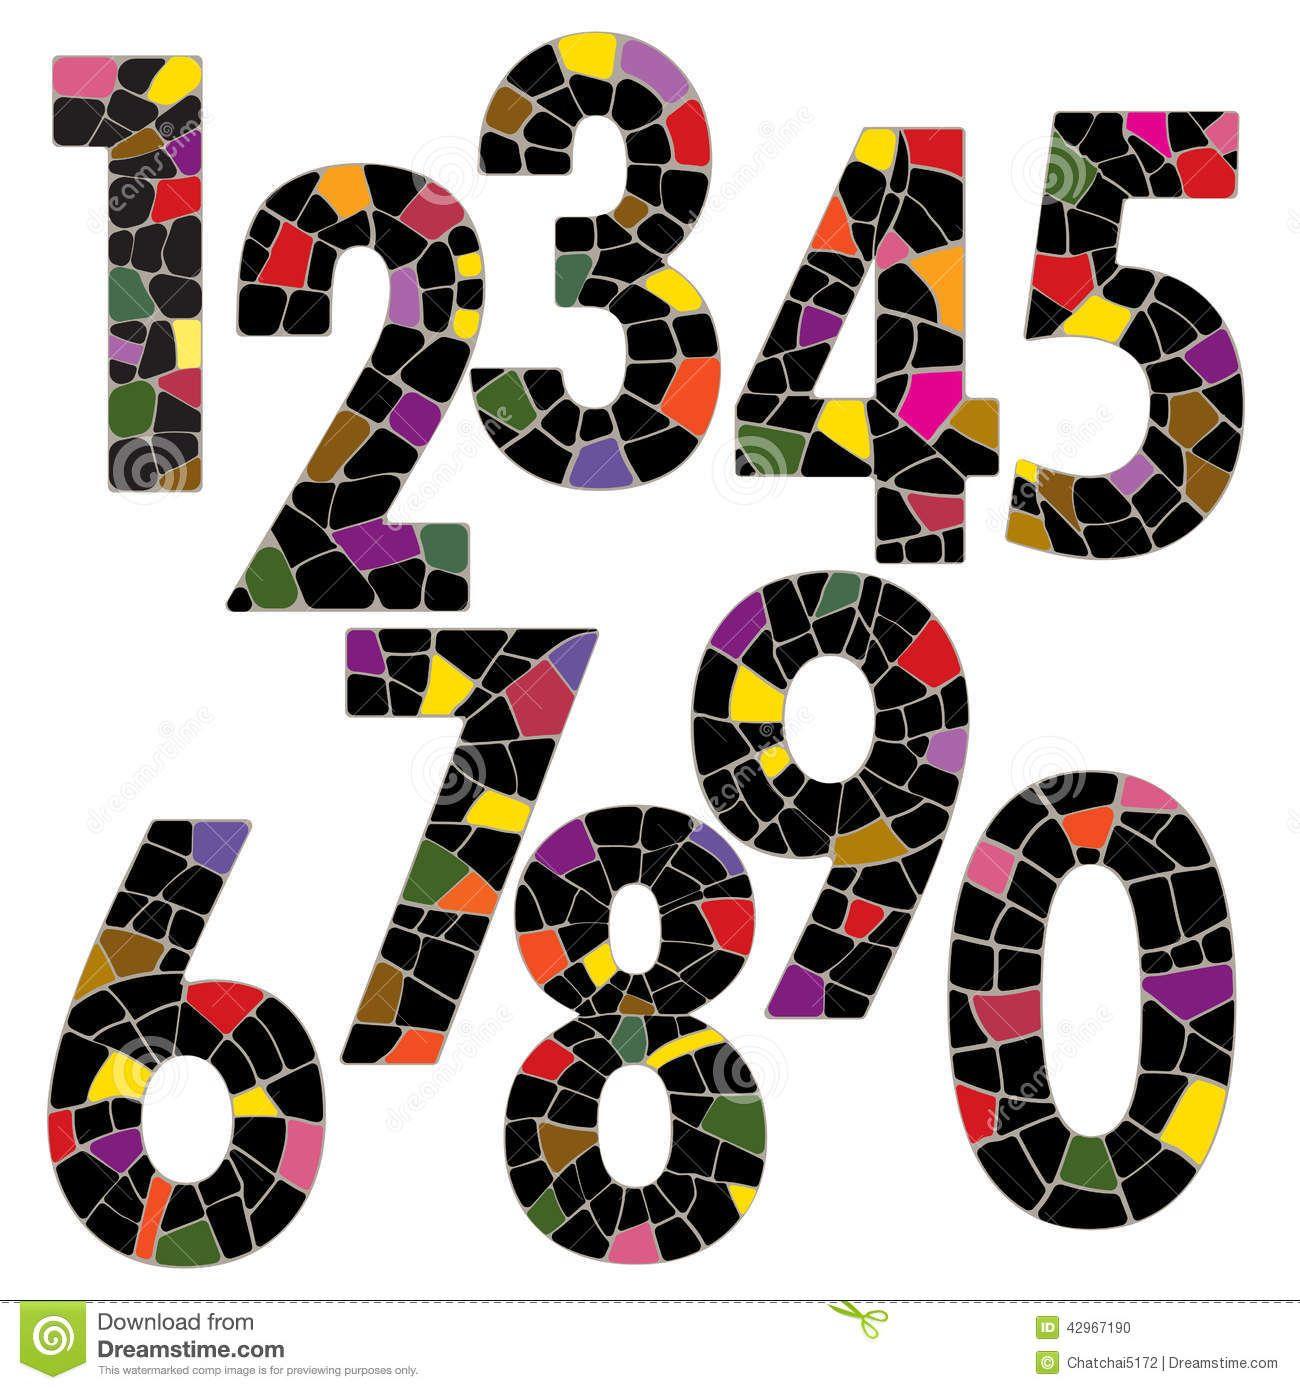 number font에 대한 이미지 검색결과 Civil service exam, Civil